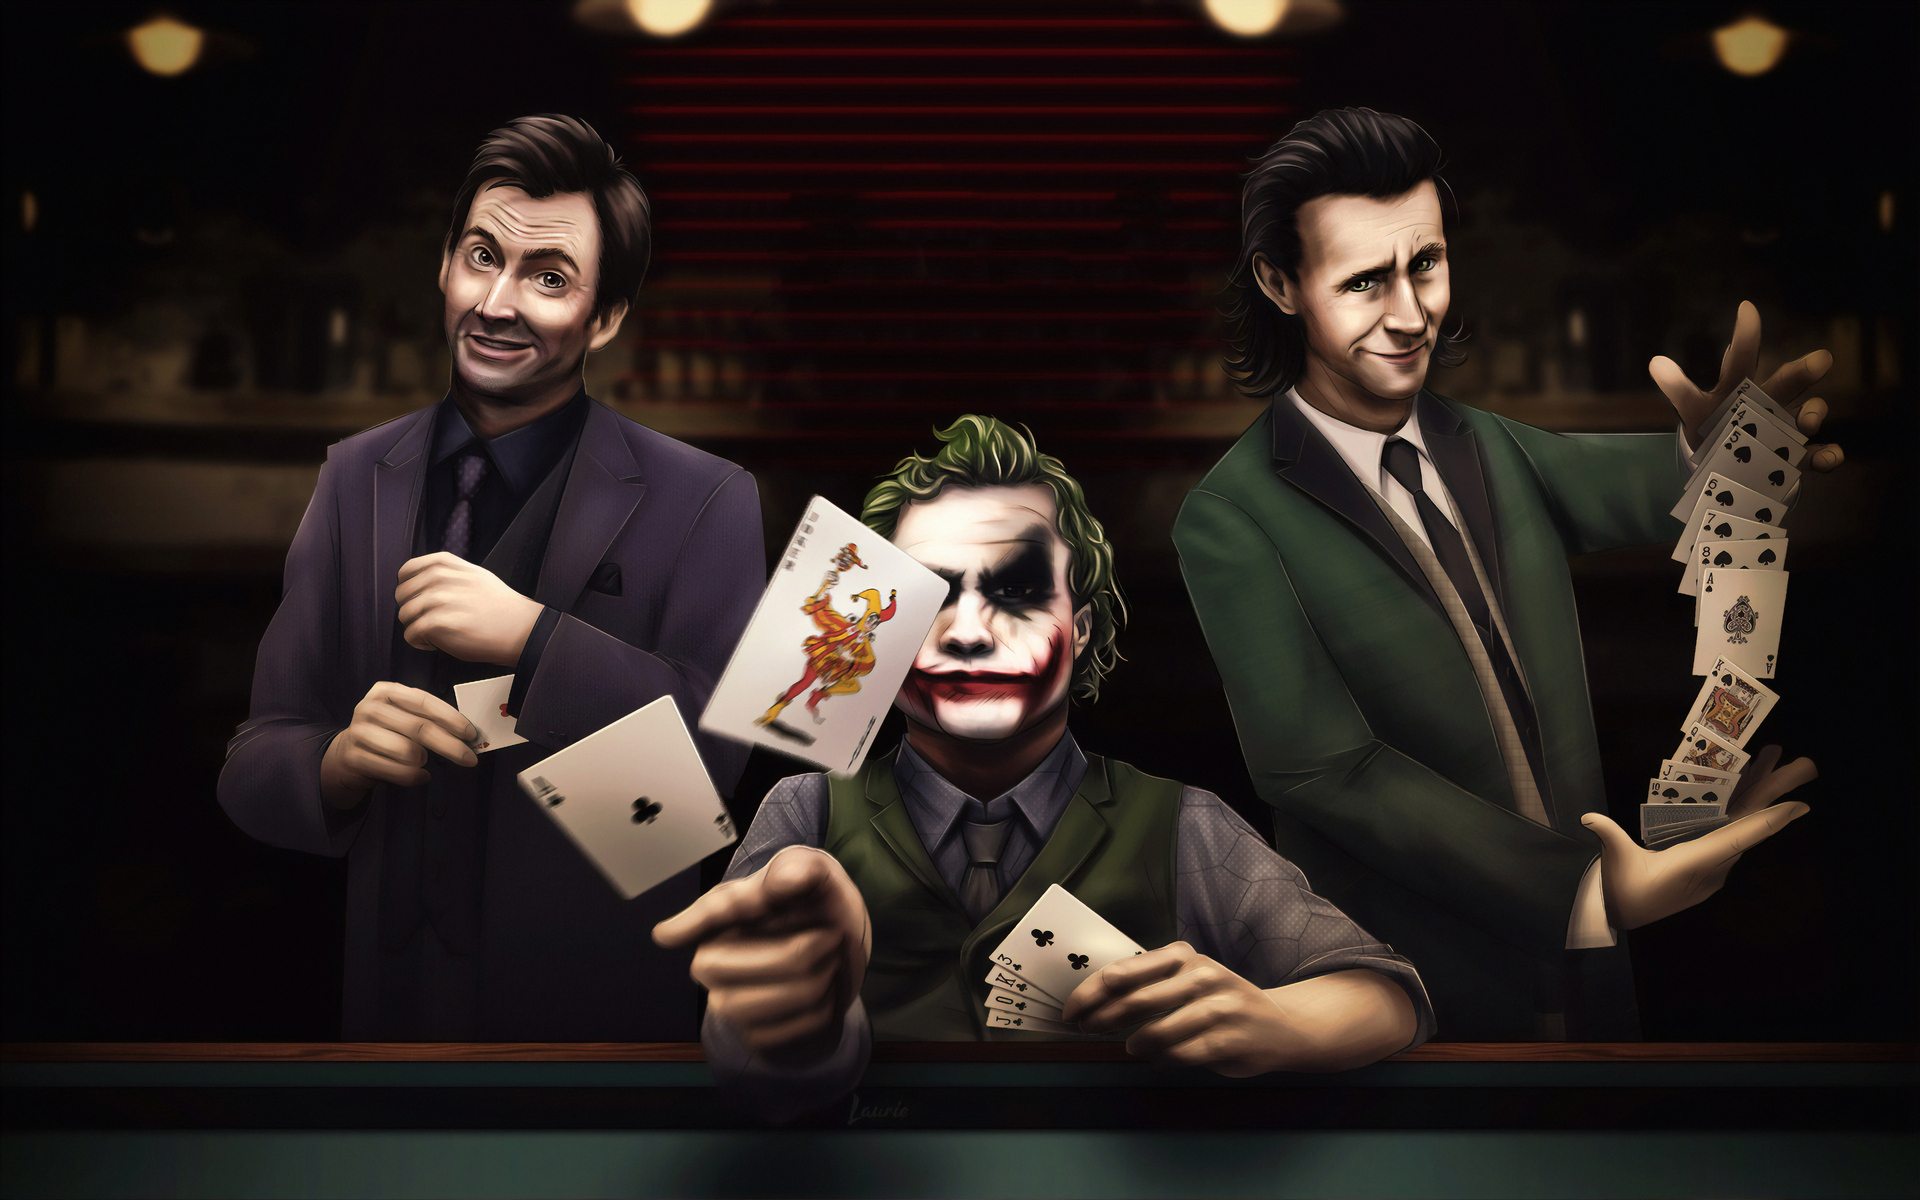 joker-the-mad-one-zg.jpg